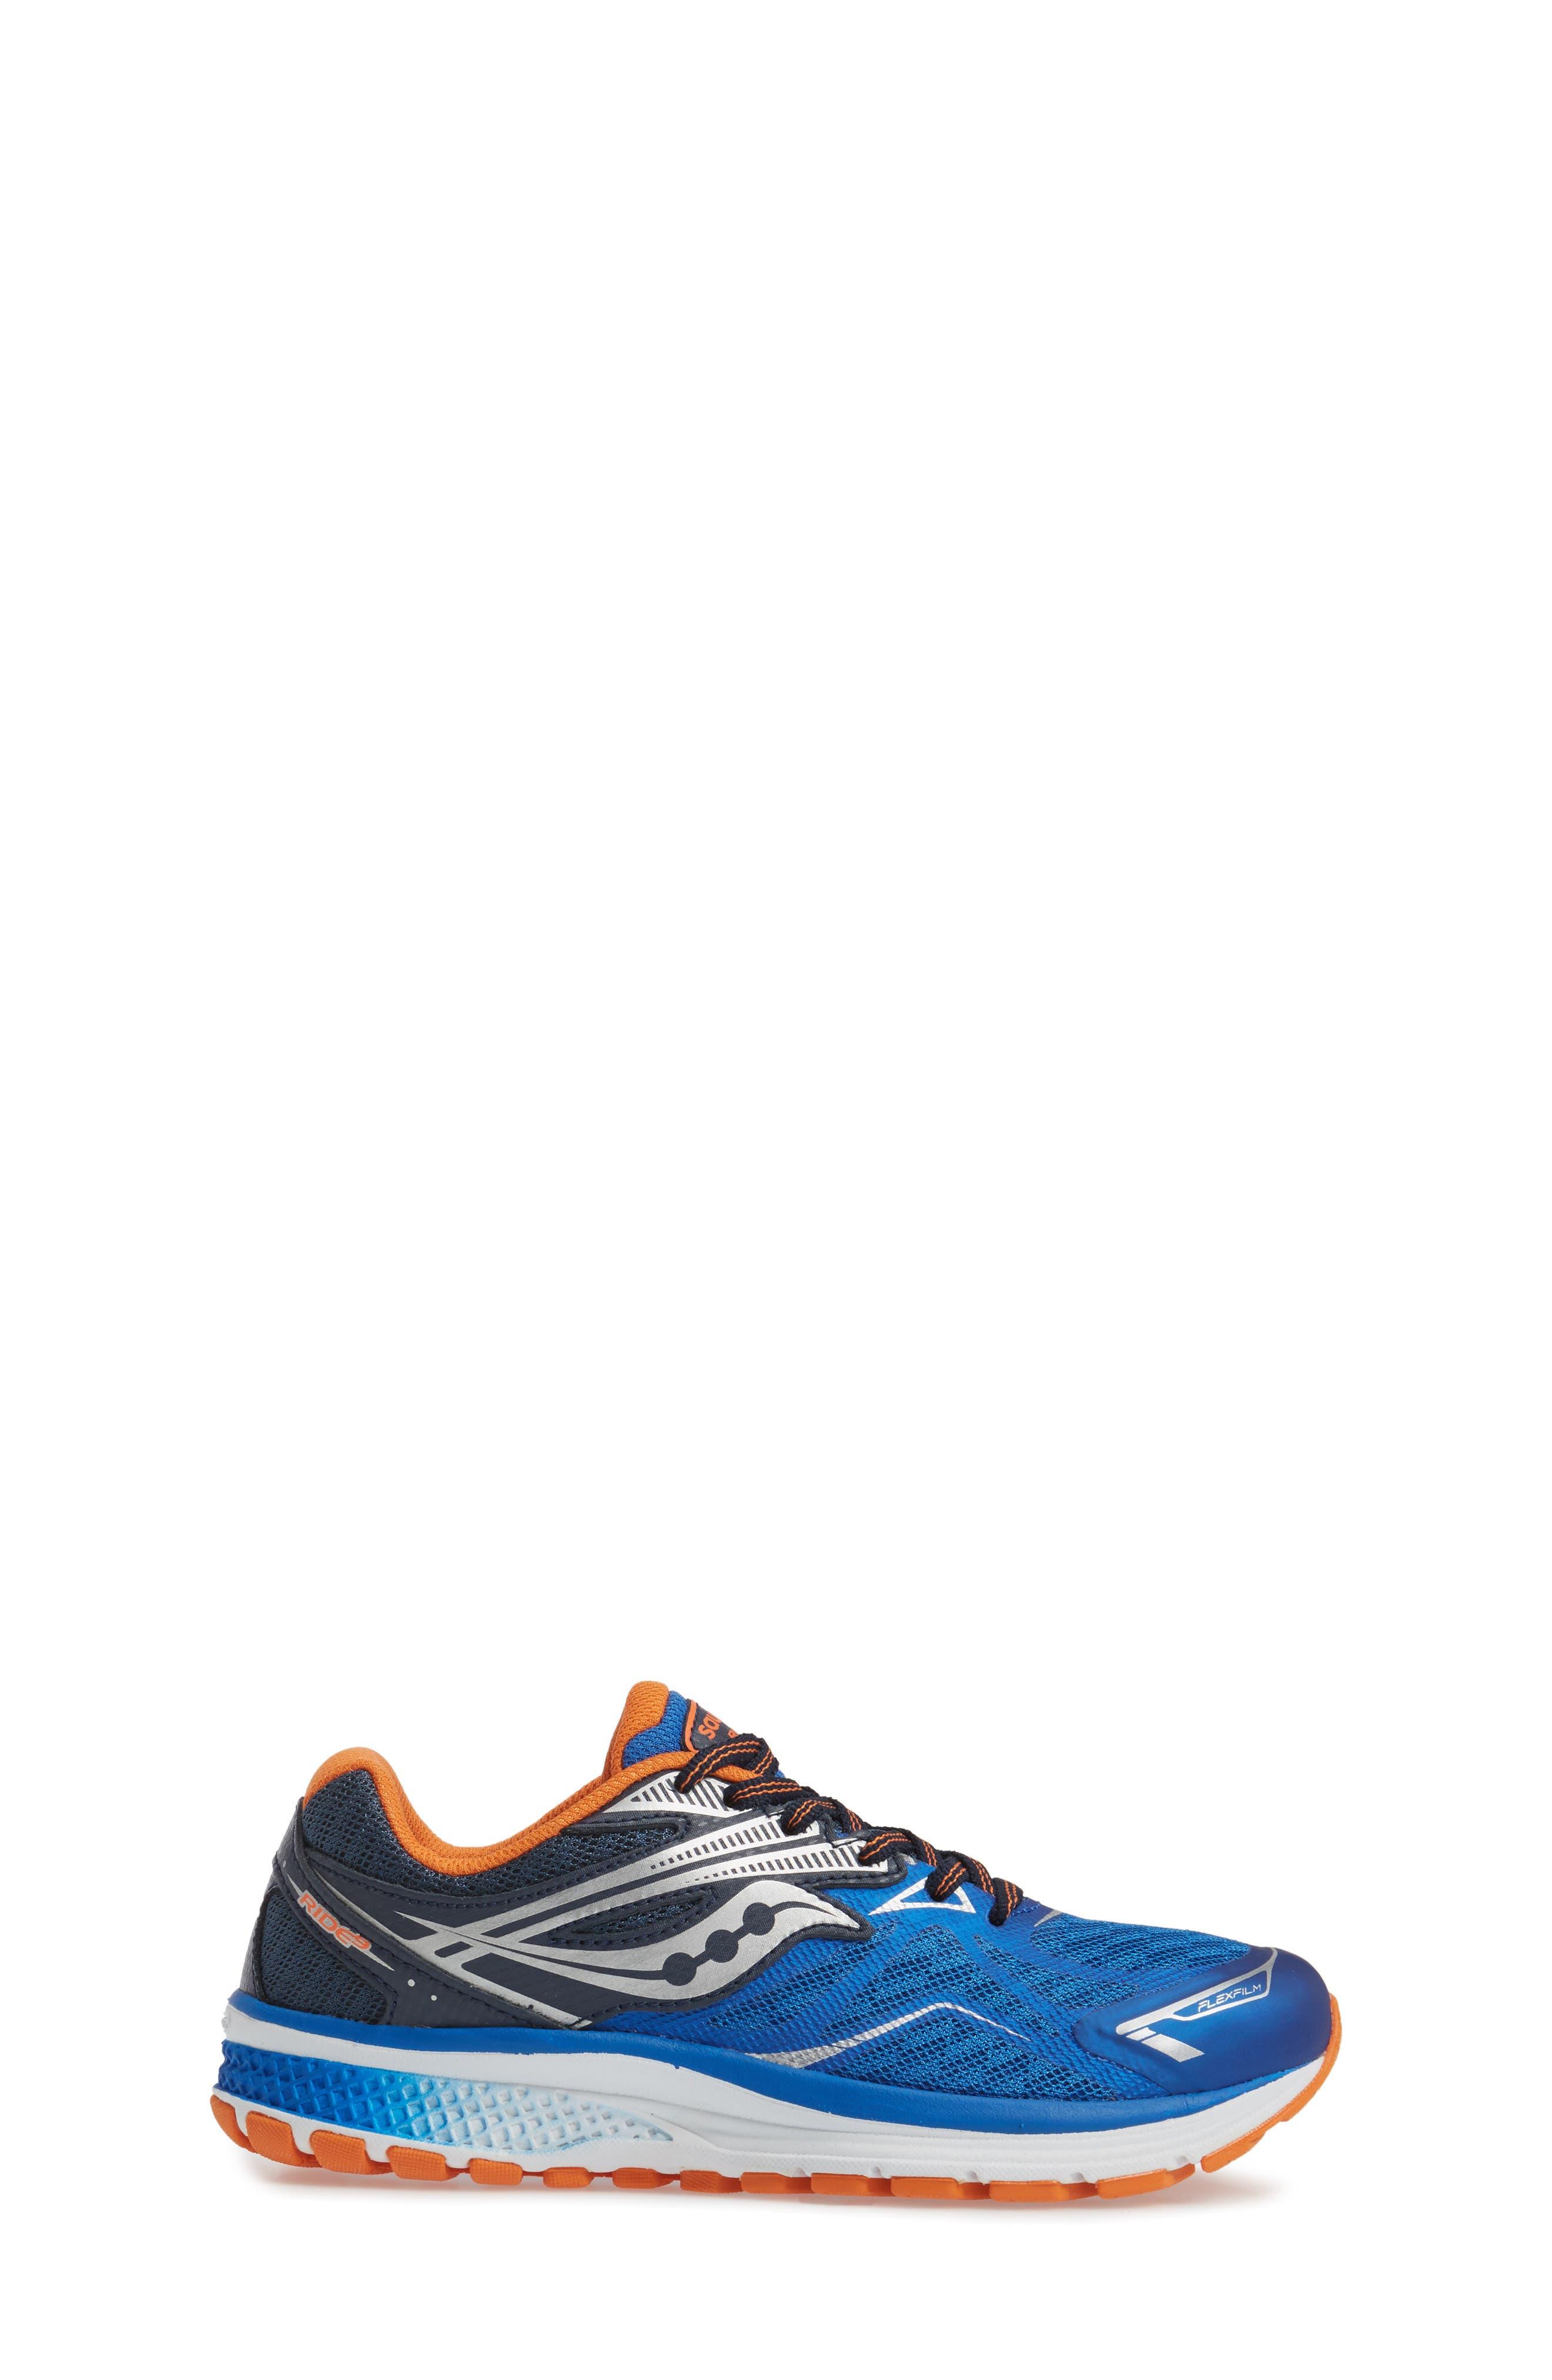 Guide 9 Running Shoe,                             Alternate thumbnail 3, color,                             400